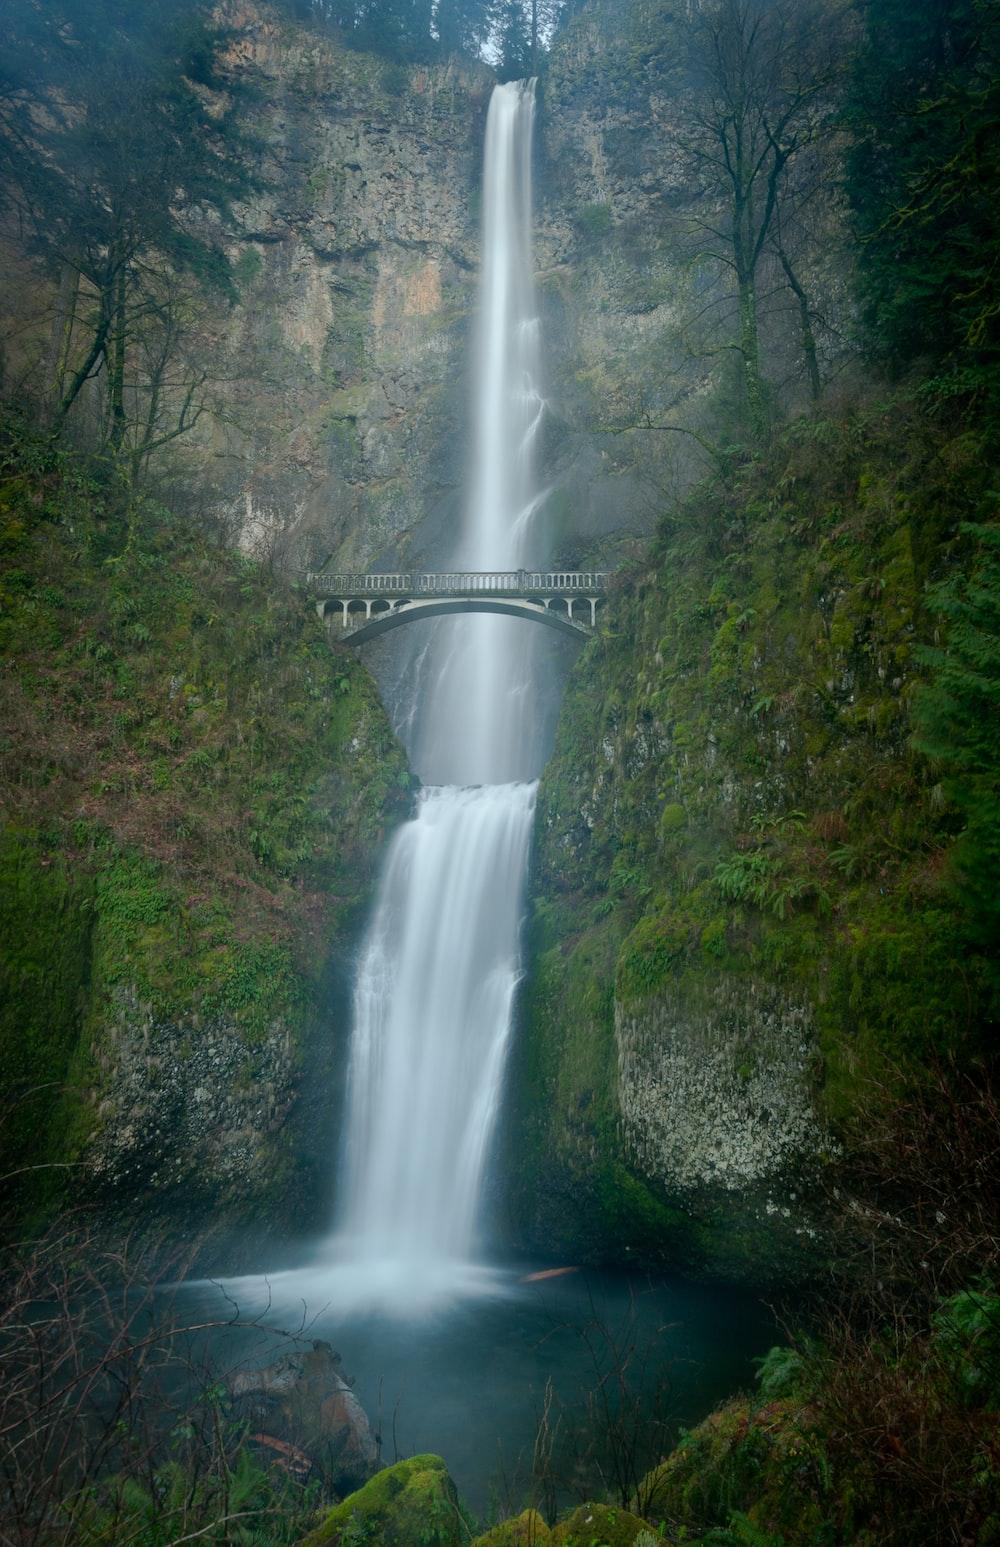 white bridge over waterfalls during daytime